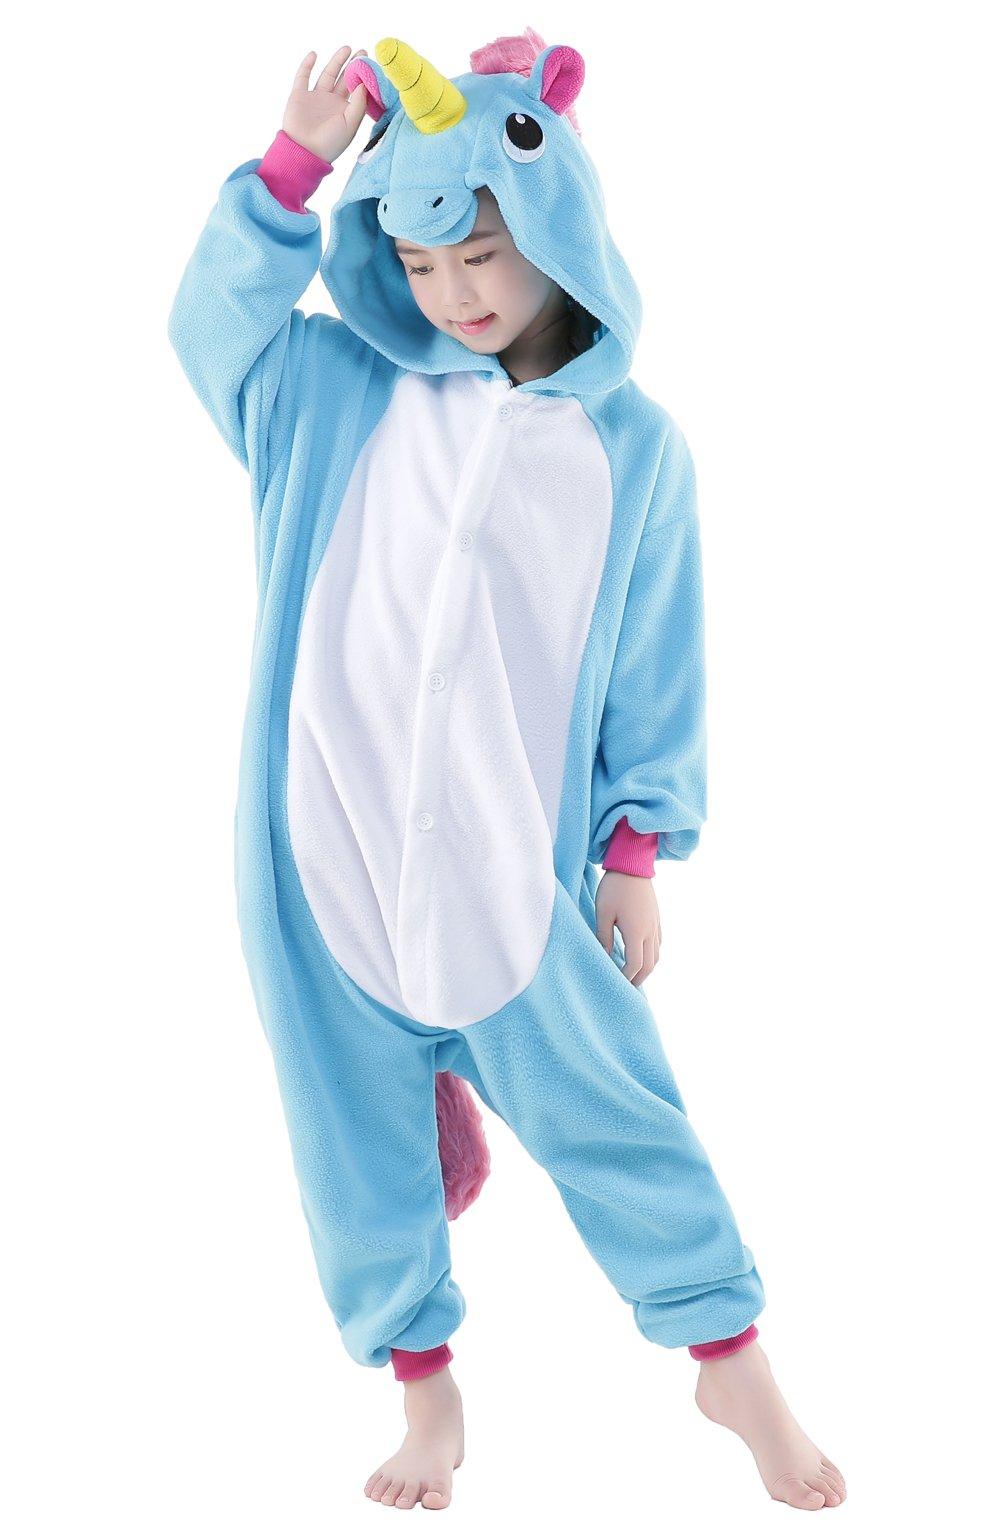 2c06bcbb8dab Galleon - NEWCOSPLAY Children Unisex Unicorn Onesie Pajamas Costume ...